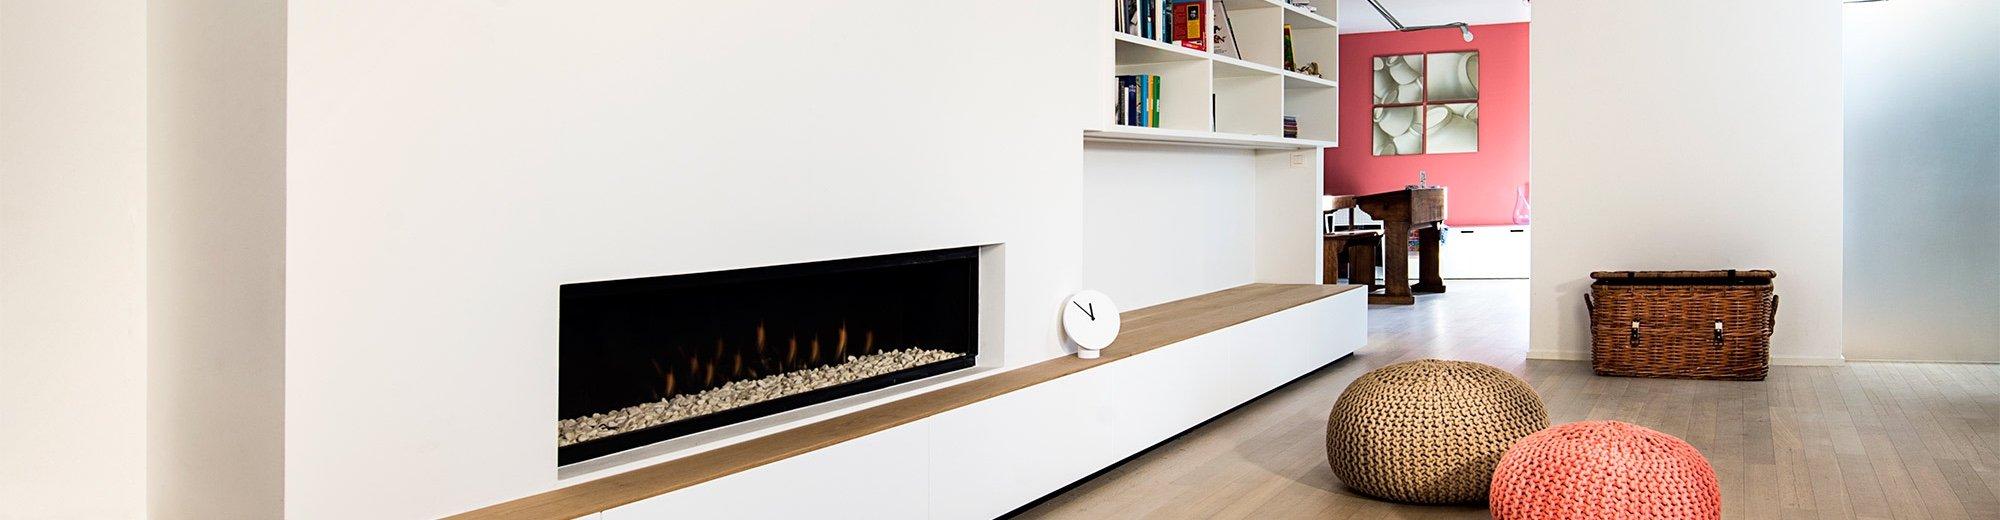 Beautiful Top Interieur Adres Contemporary - Ideeën Voor Thuis ...